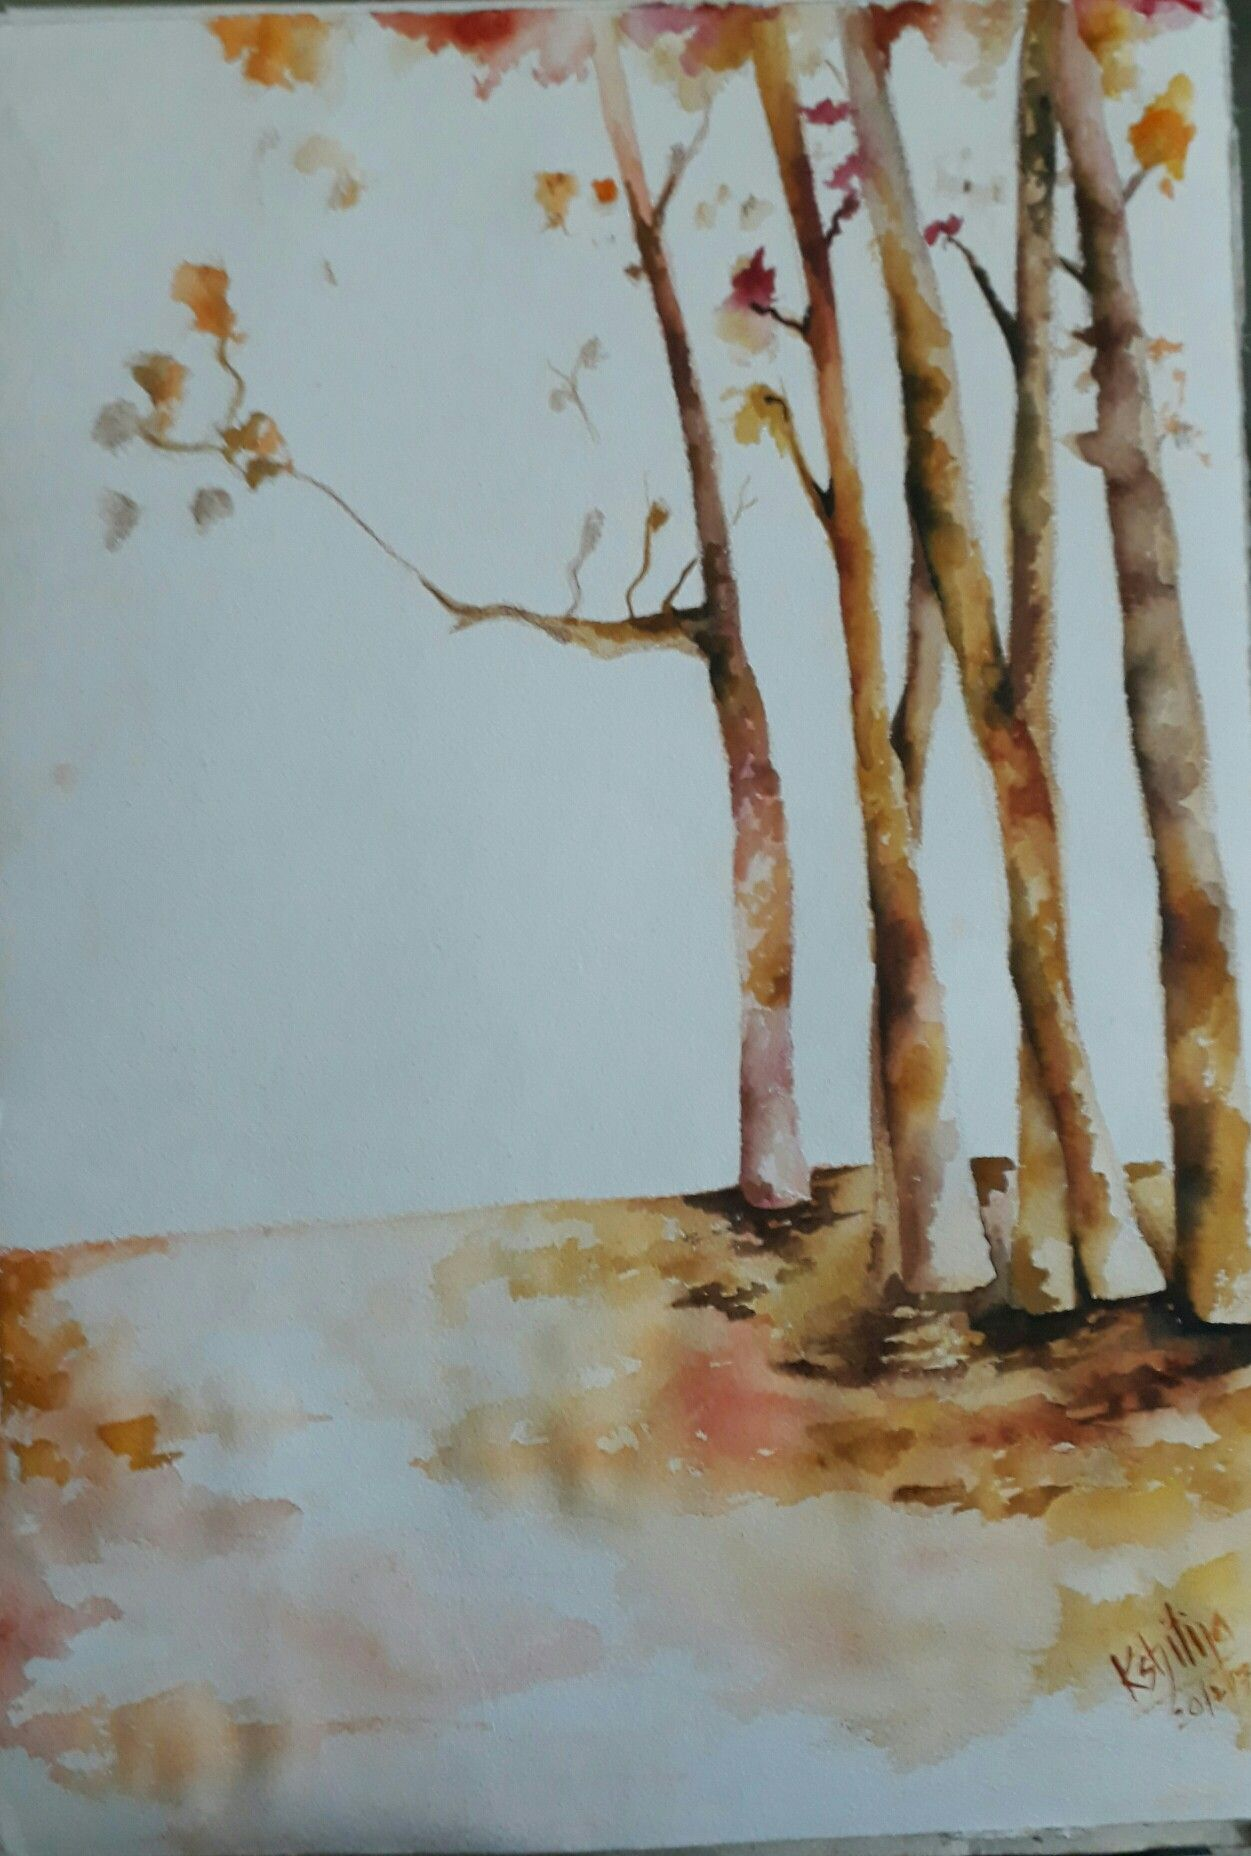 Watercolour by Kshitija Kalikar | kshitija | Pinterest | Watercolor